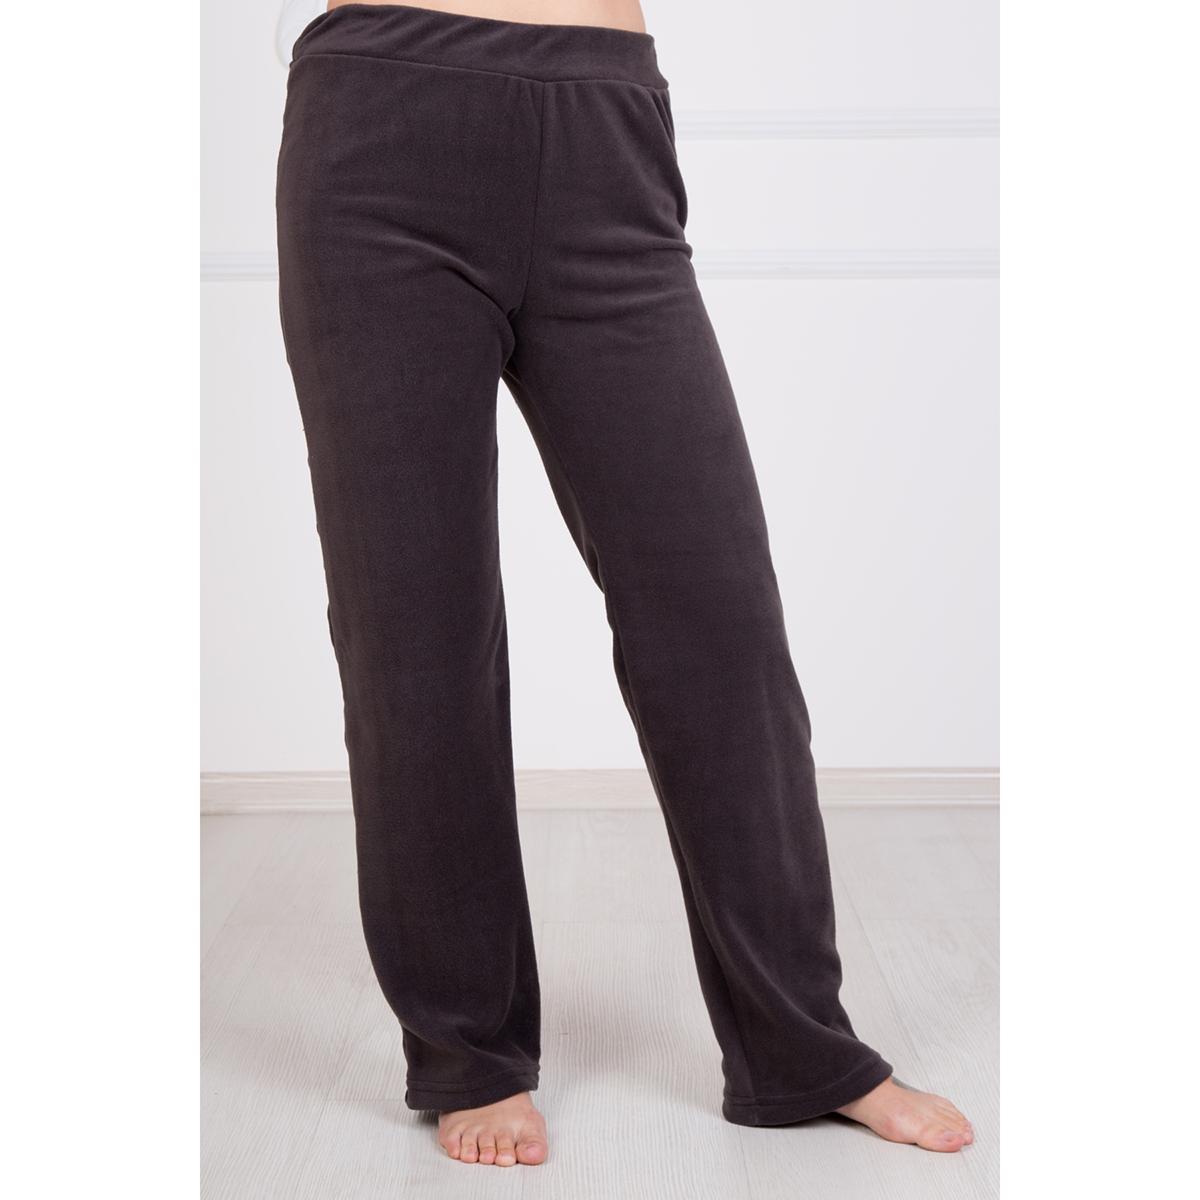 Женские брюки Флис, размер 42Брюки<br>Обхват талии:65 см<br>Обхват бедер:92 см<br>Рост:167 см<br><br>Тип: Жен. брюки<br>Размер: 42<br>Материал: Флис